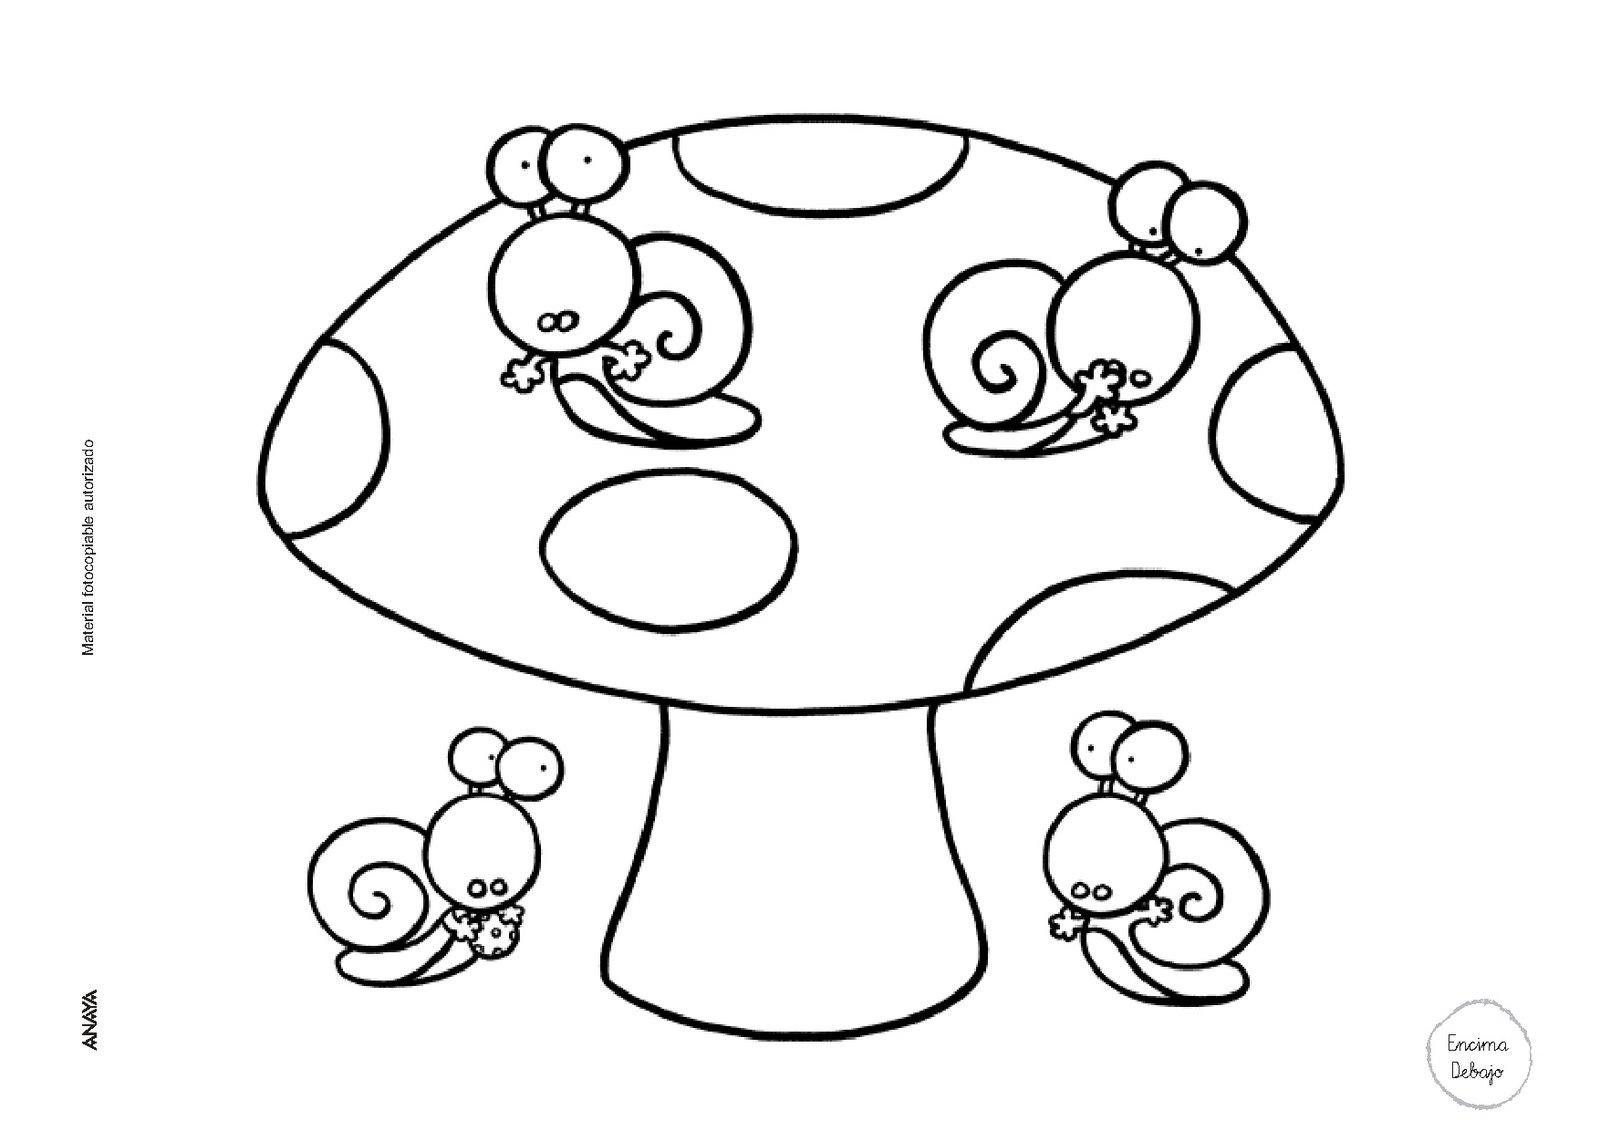 Dibujos Para Colorear Infantil 4 Anos